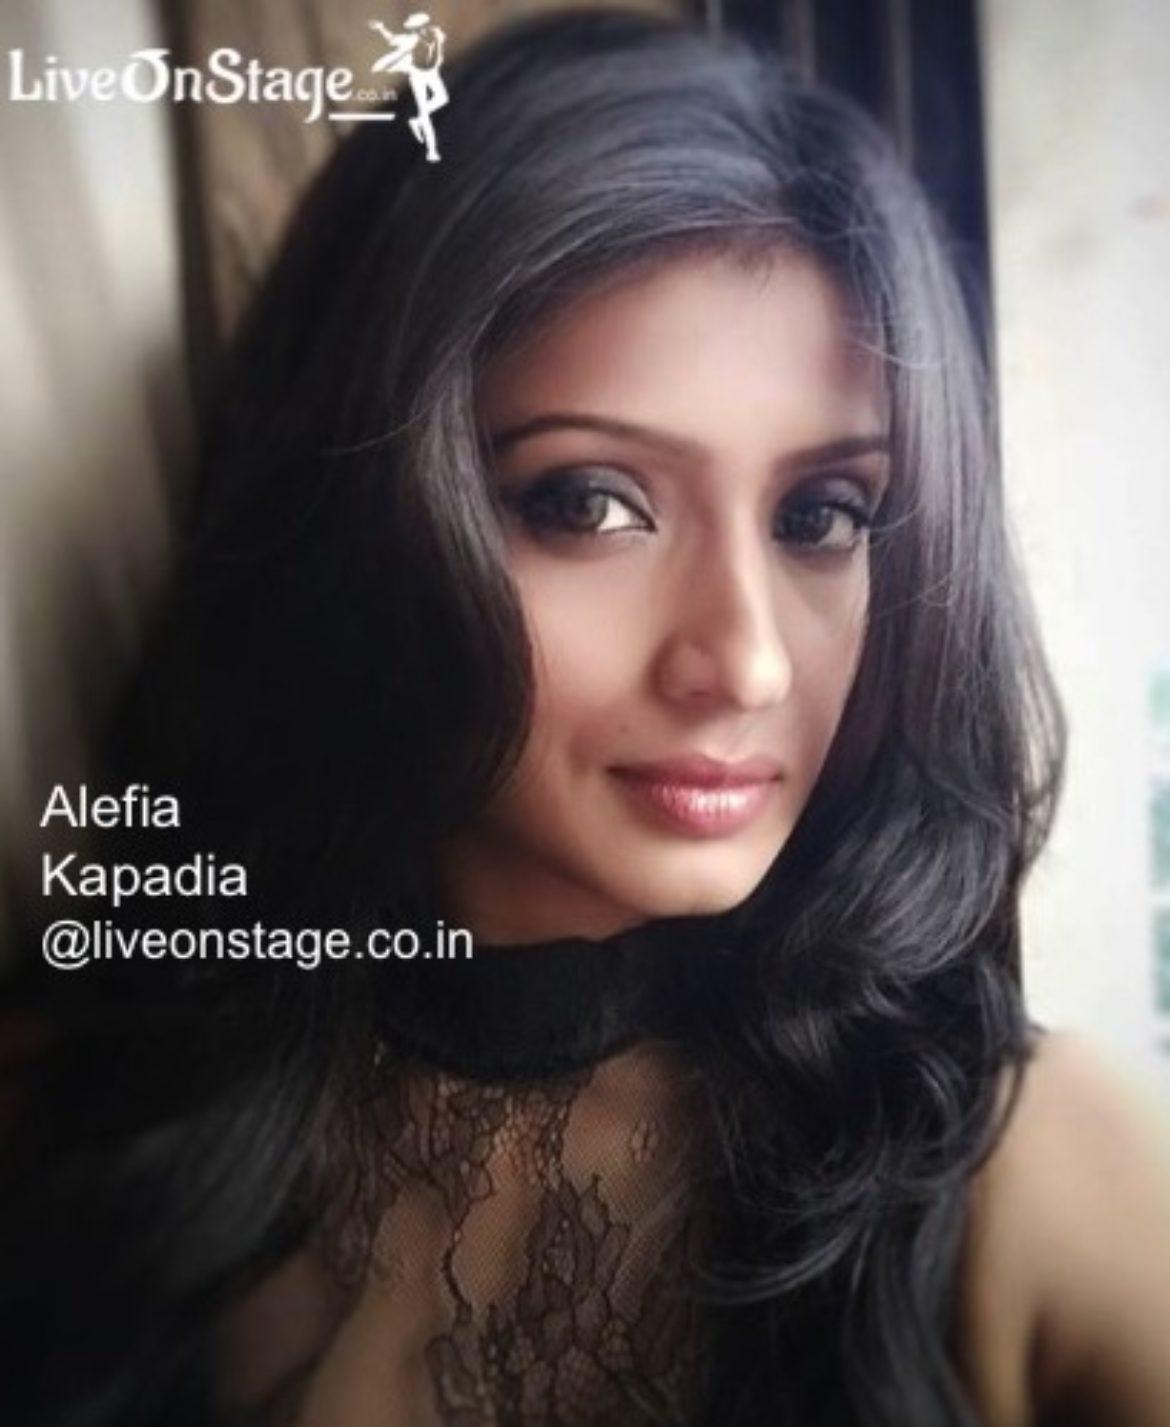 Live on stage » Television Actress & Host Alefia Kapadia